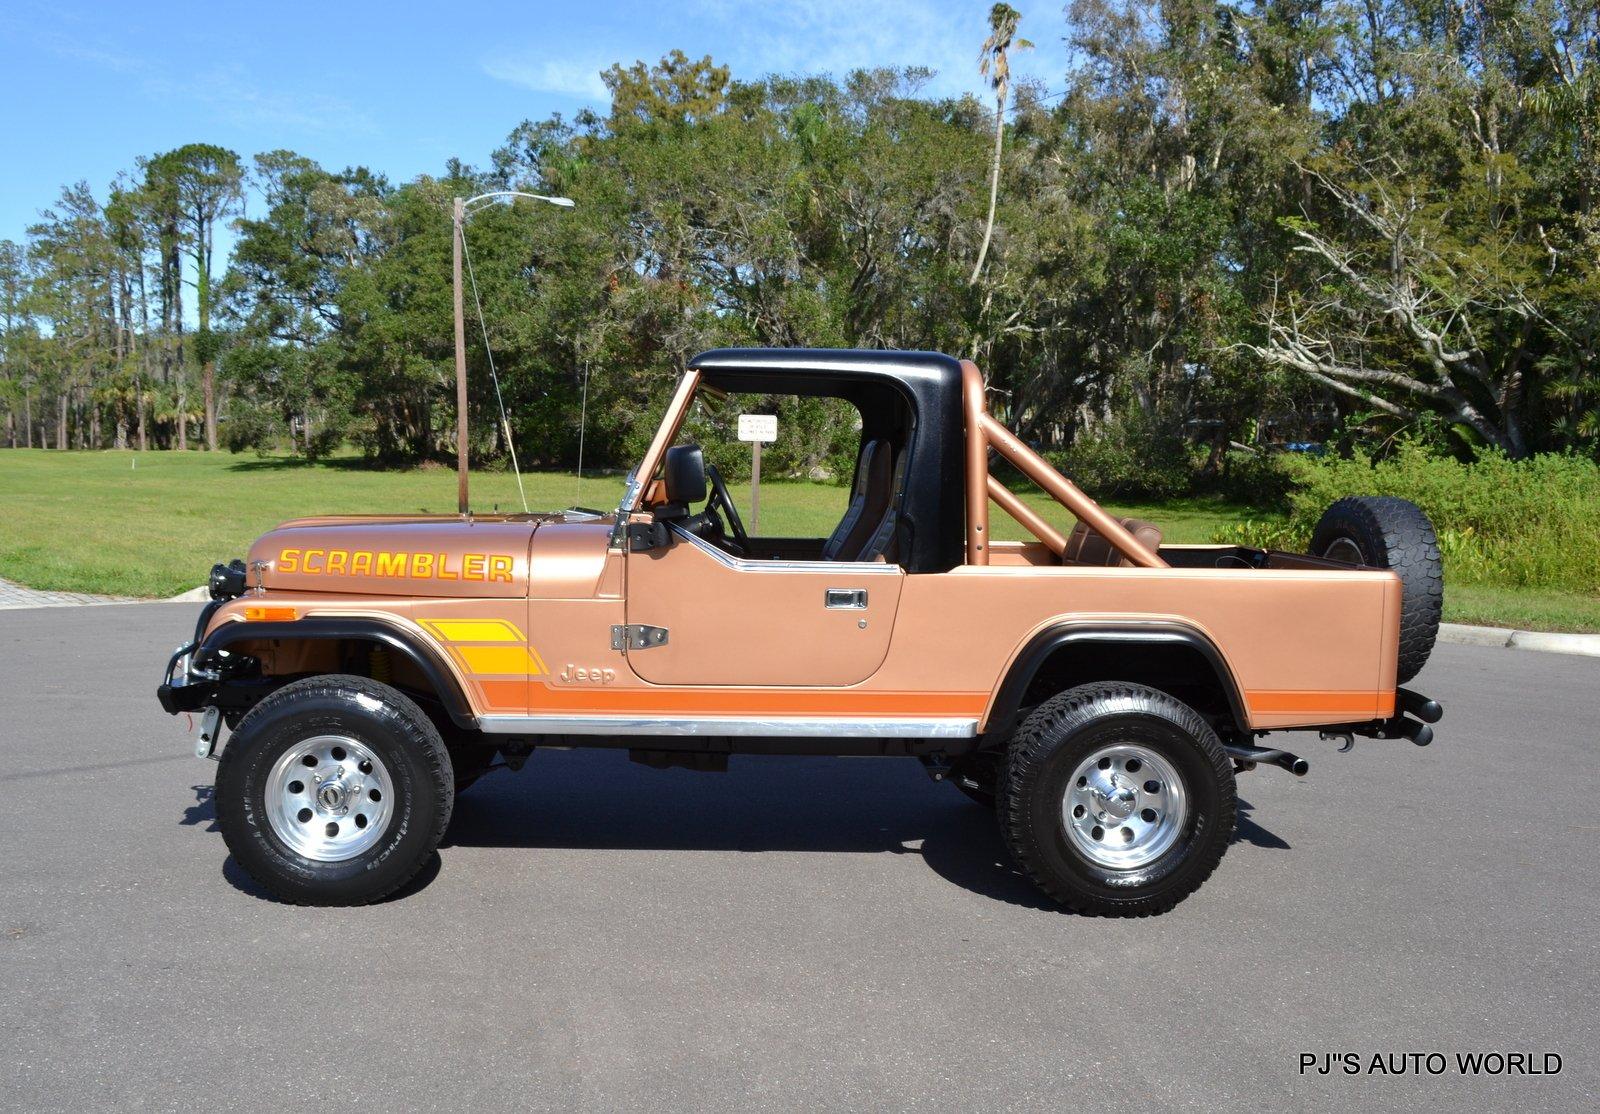 1984 Jeep Scrambler Pj S Autoworld